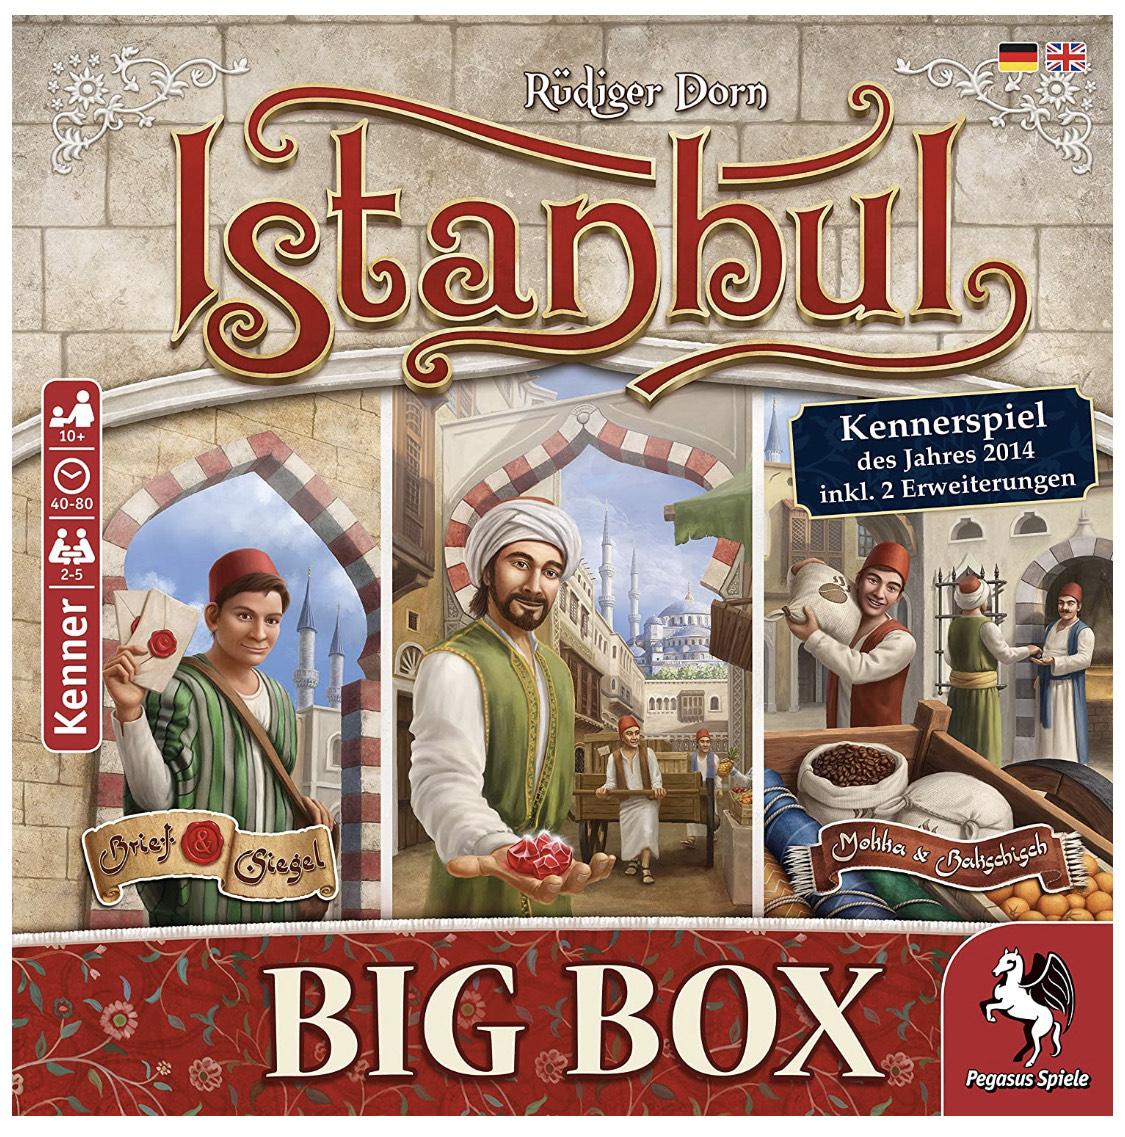 [Amazon Prime] Pegasus Spiele 55119G: Istanbul Big Box (Rüdiger Dorn, Kennerspiel des Jahres 2014, BGG 7.6)